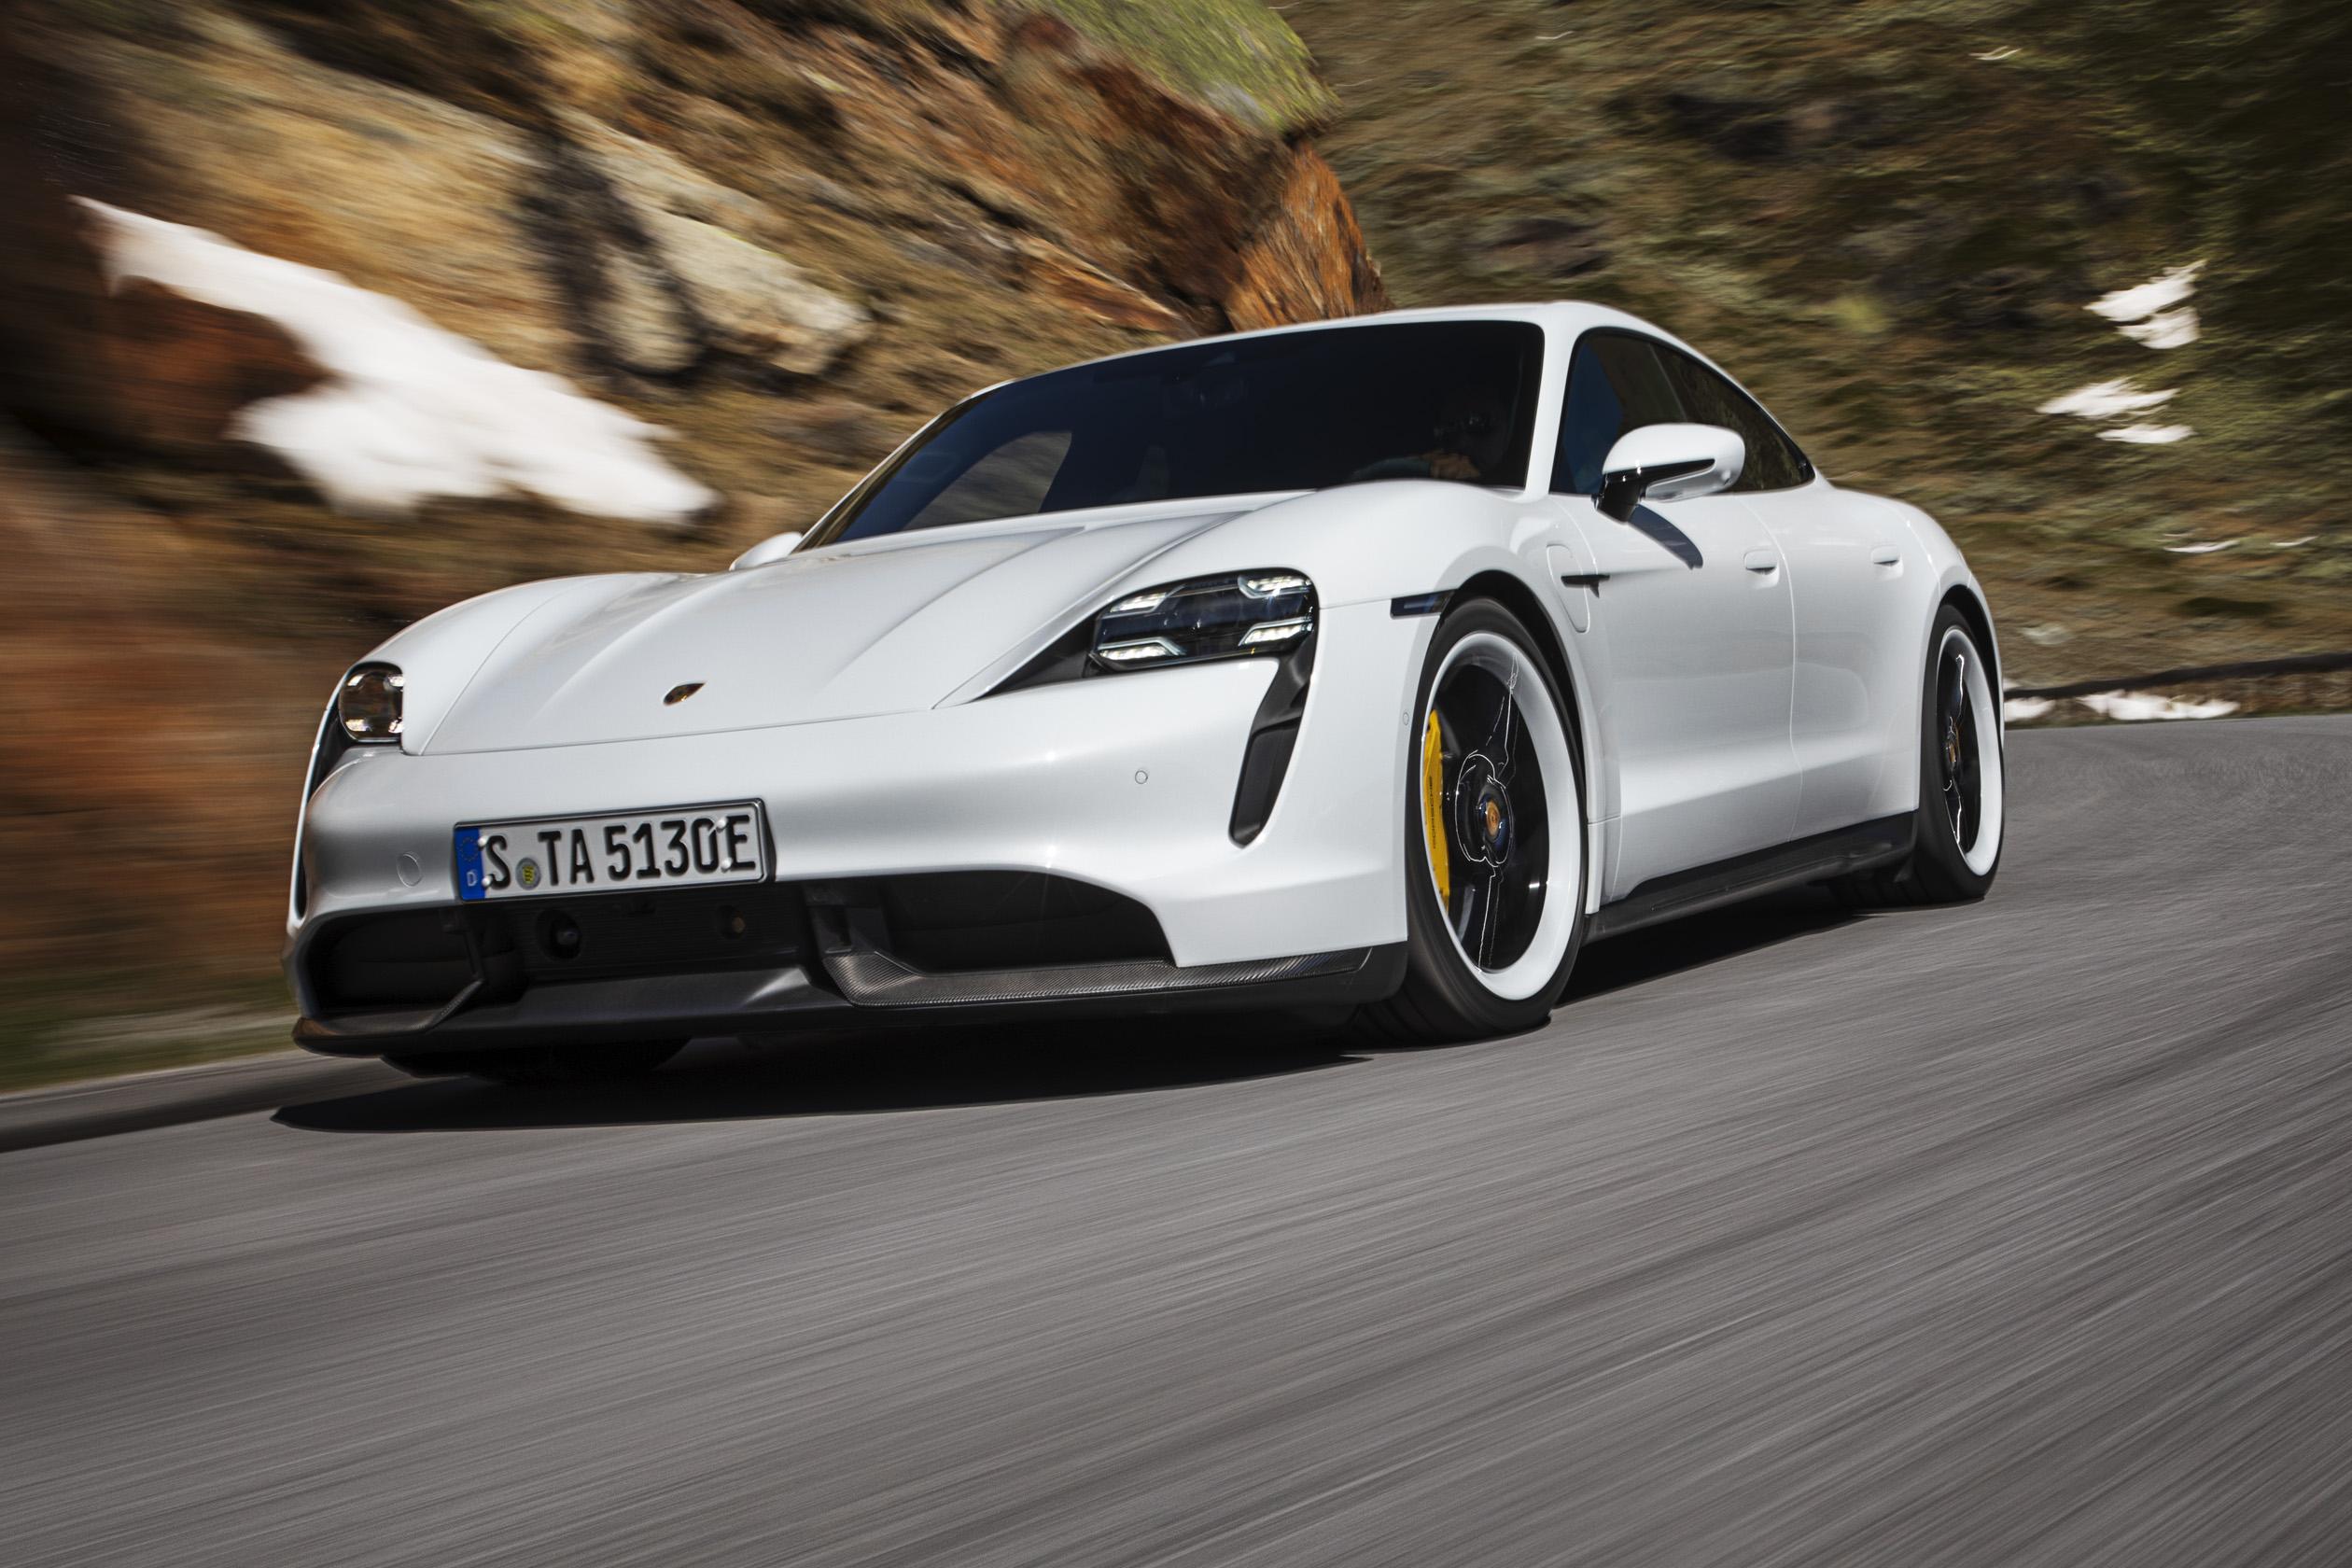 Porsche Taycan Tesla-killer